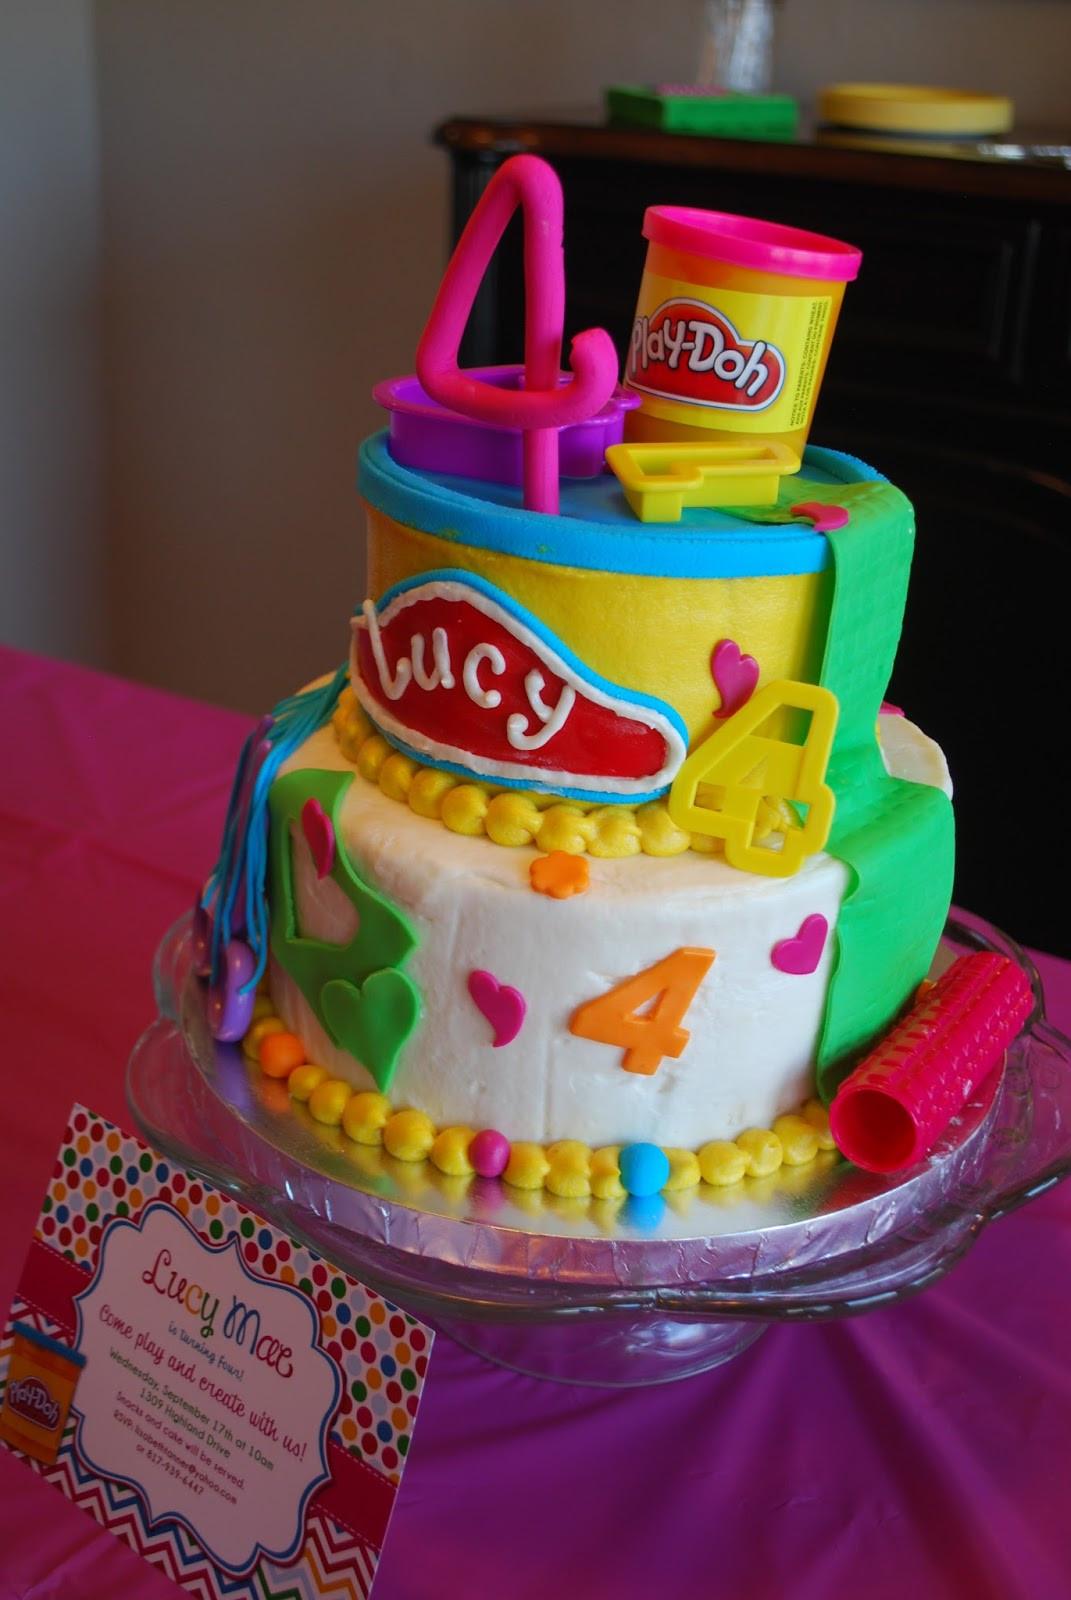 Play Doh Birthday Cake  The Tanner Manor Play doh 4th Birthday